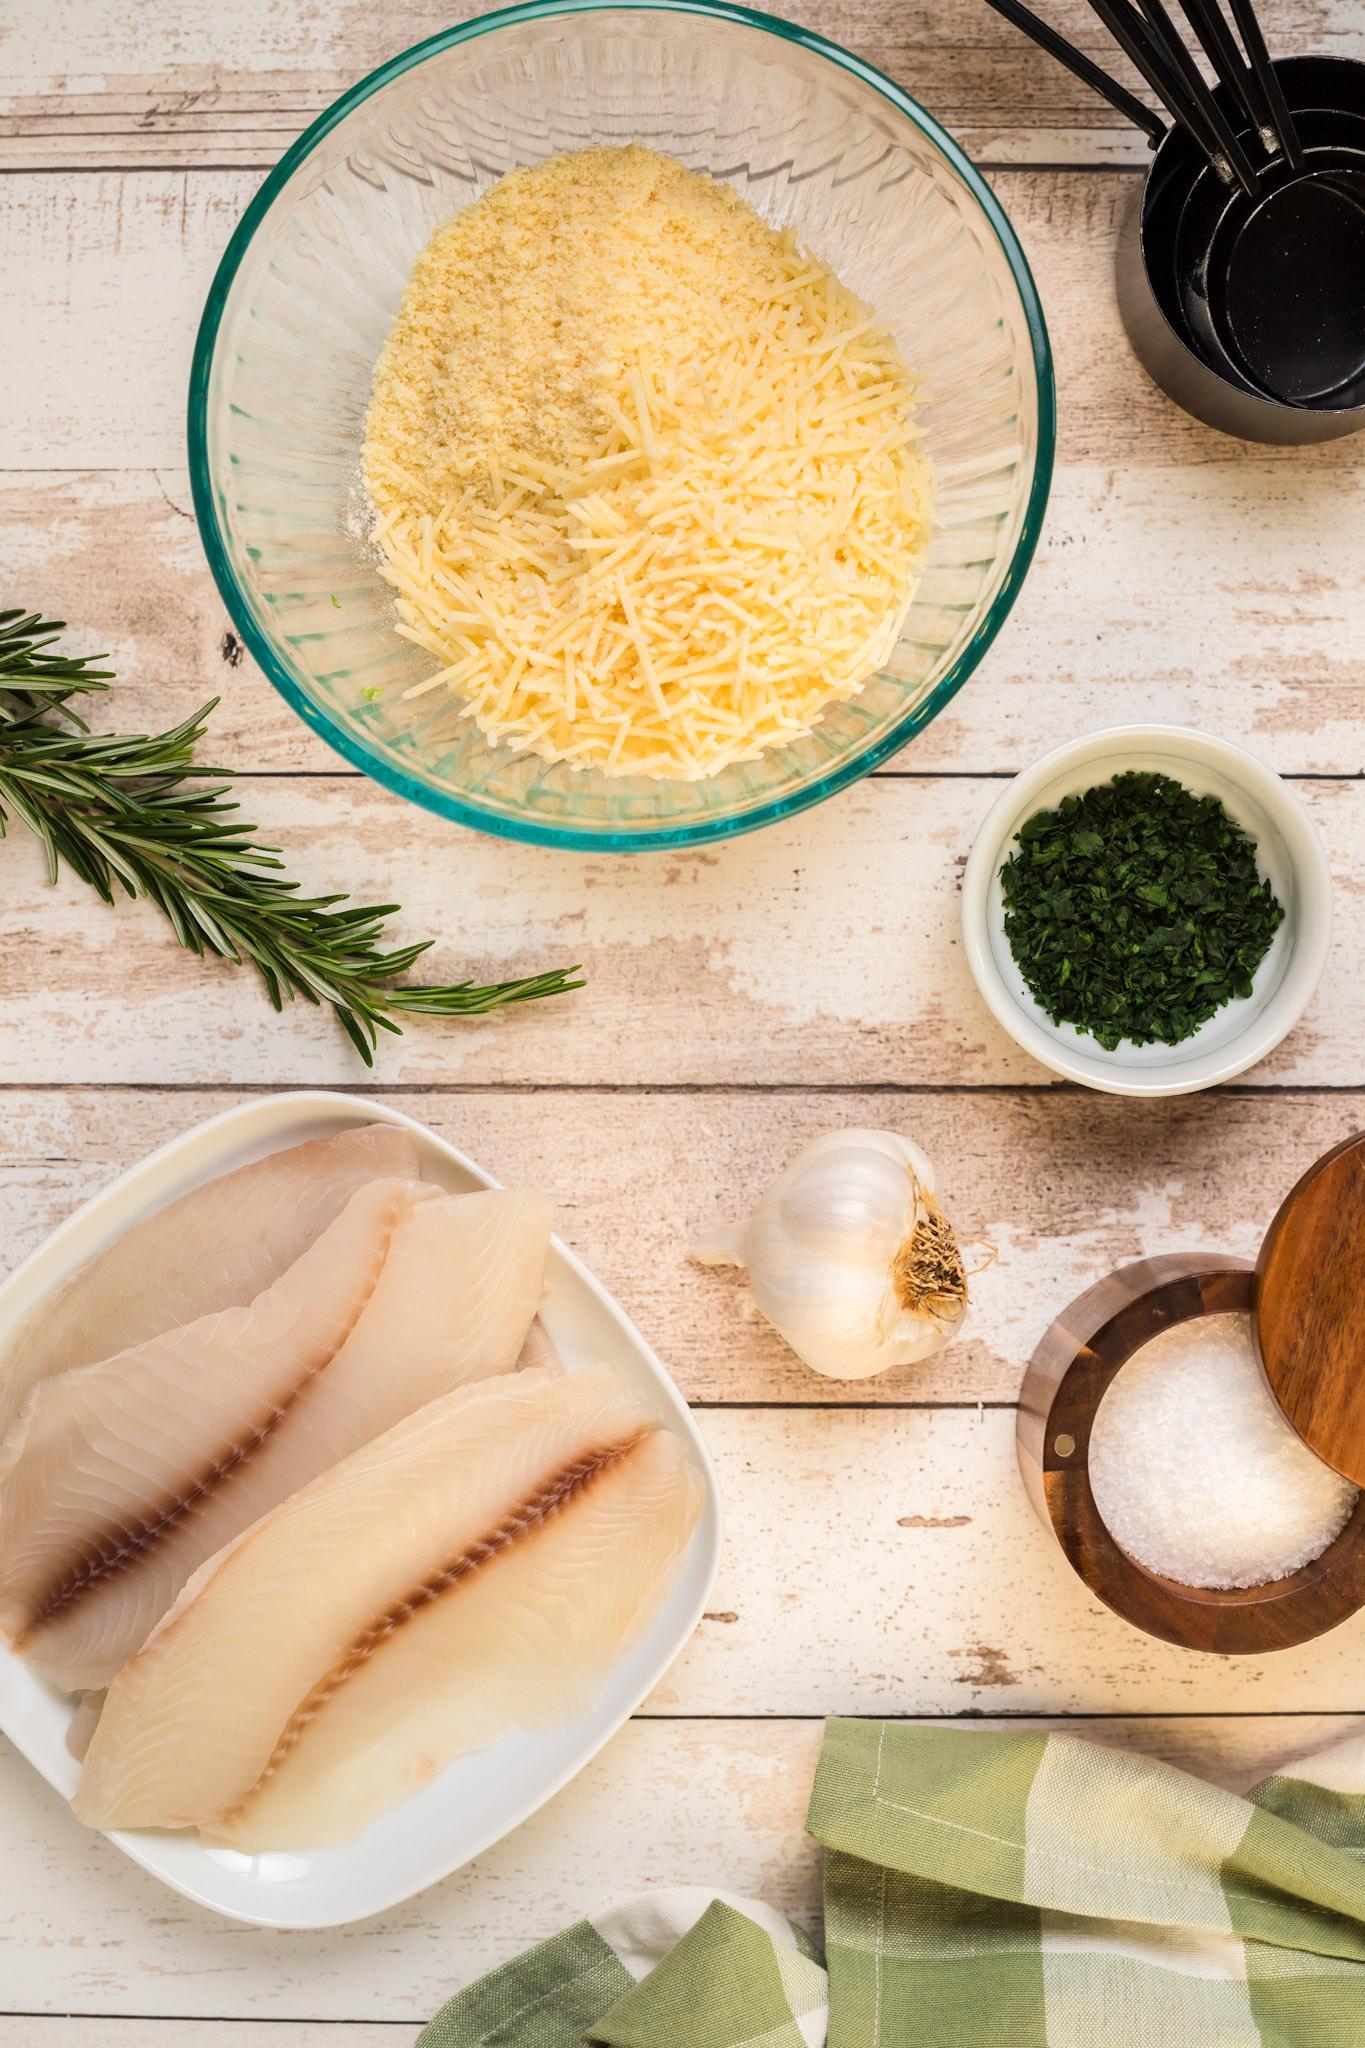 Parmesan Crusted Tilapia with flour